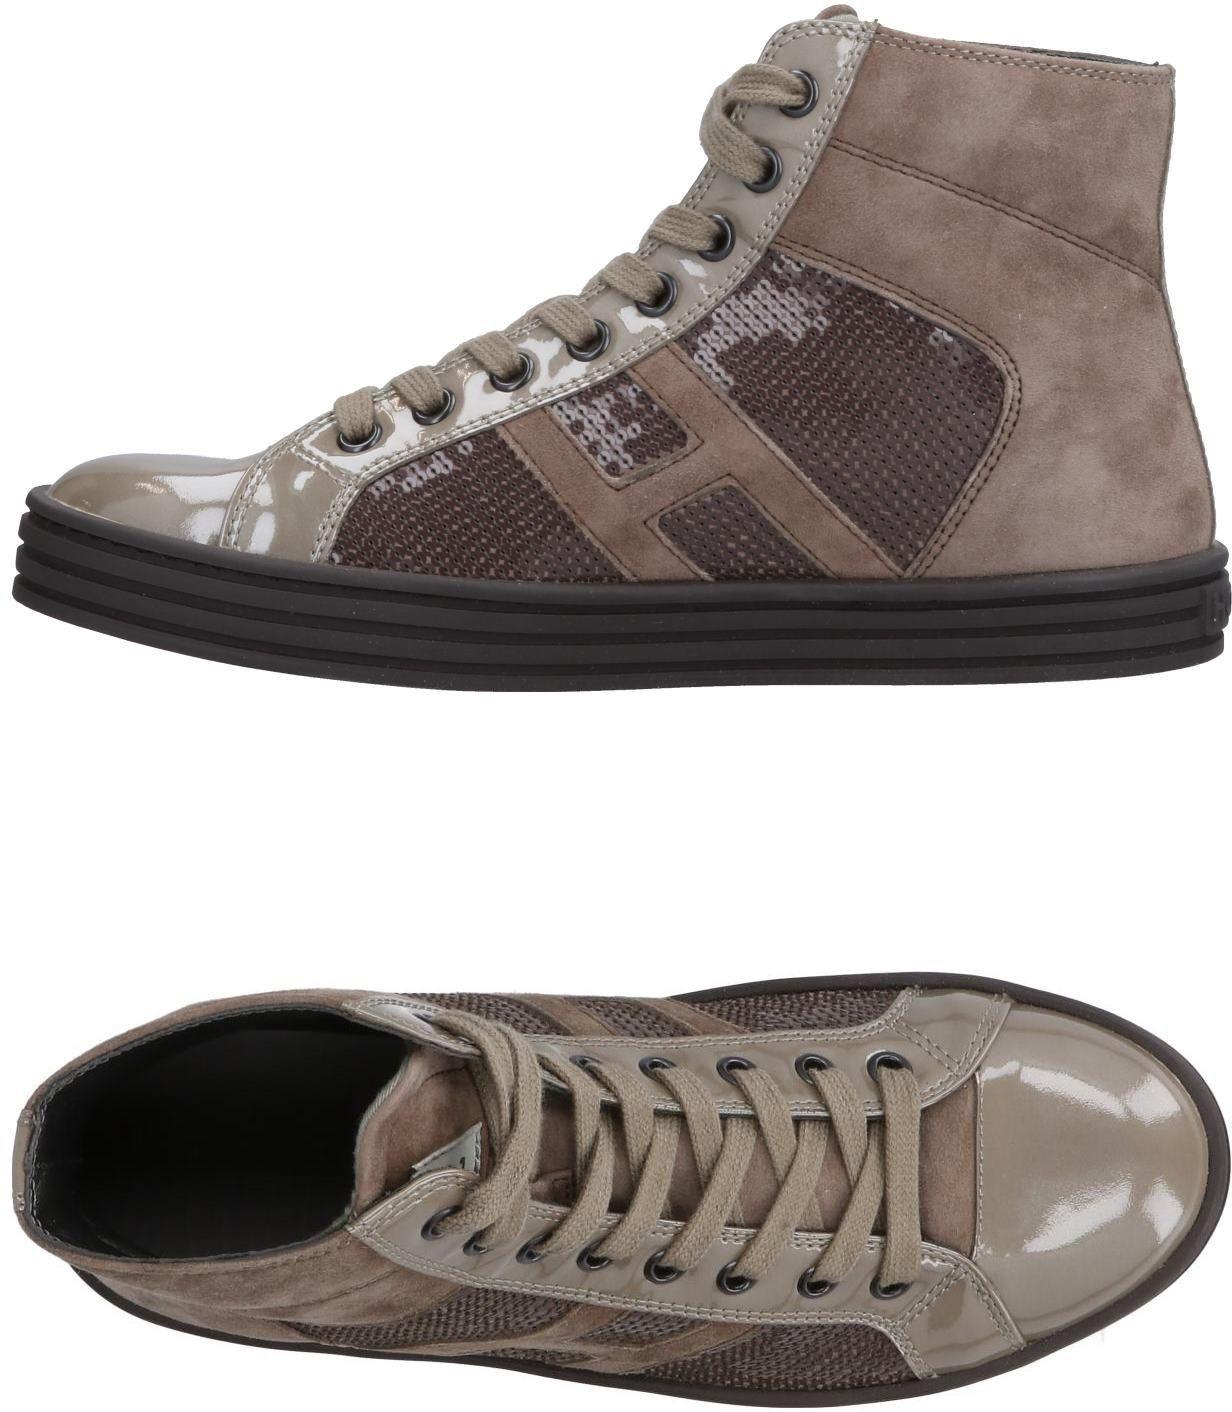 739d117256ac0 HOGAN REBEL - CALZATURE - Sneakers   Tennis shoes alte -